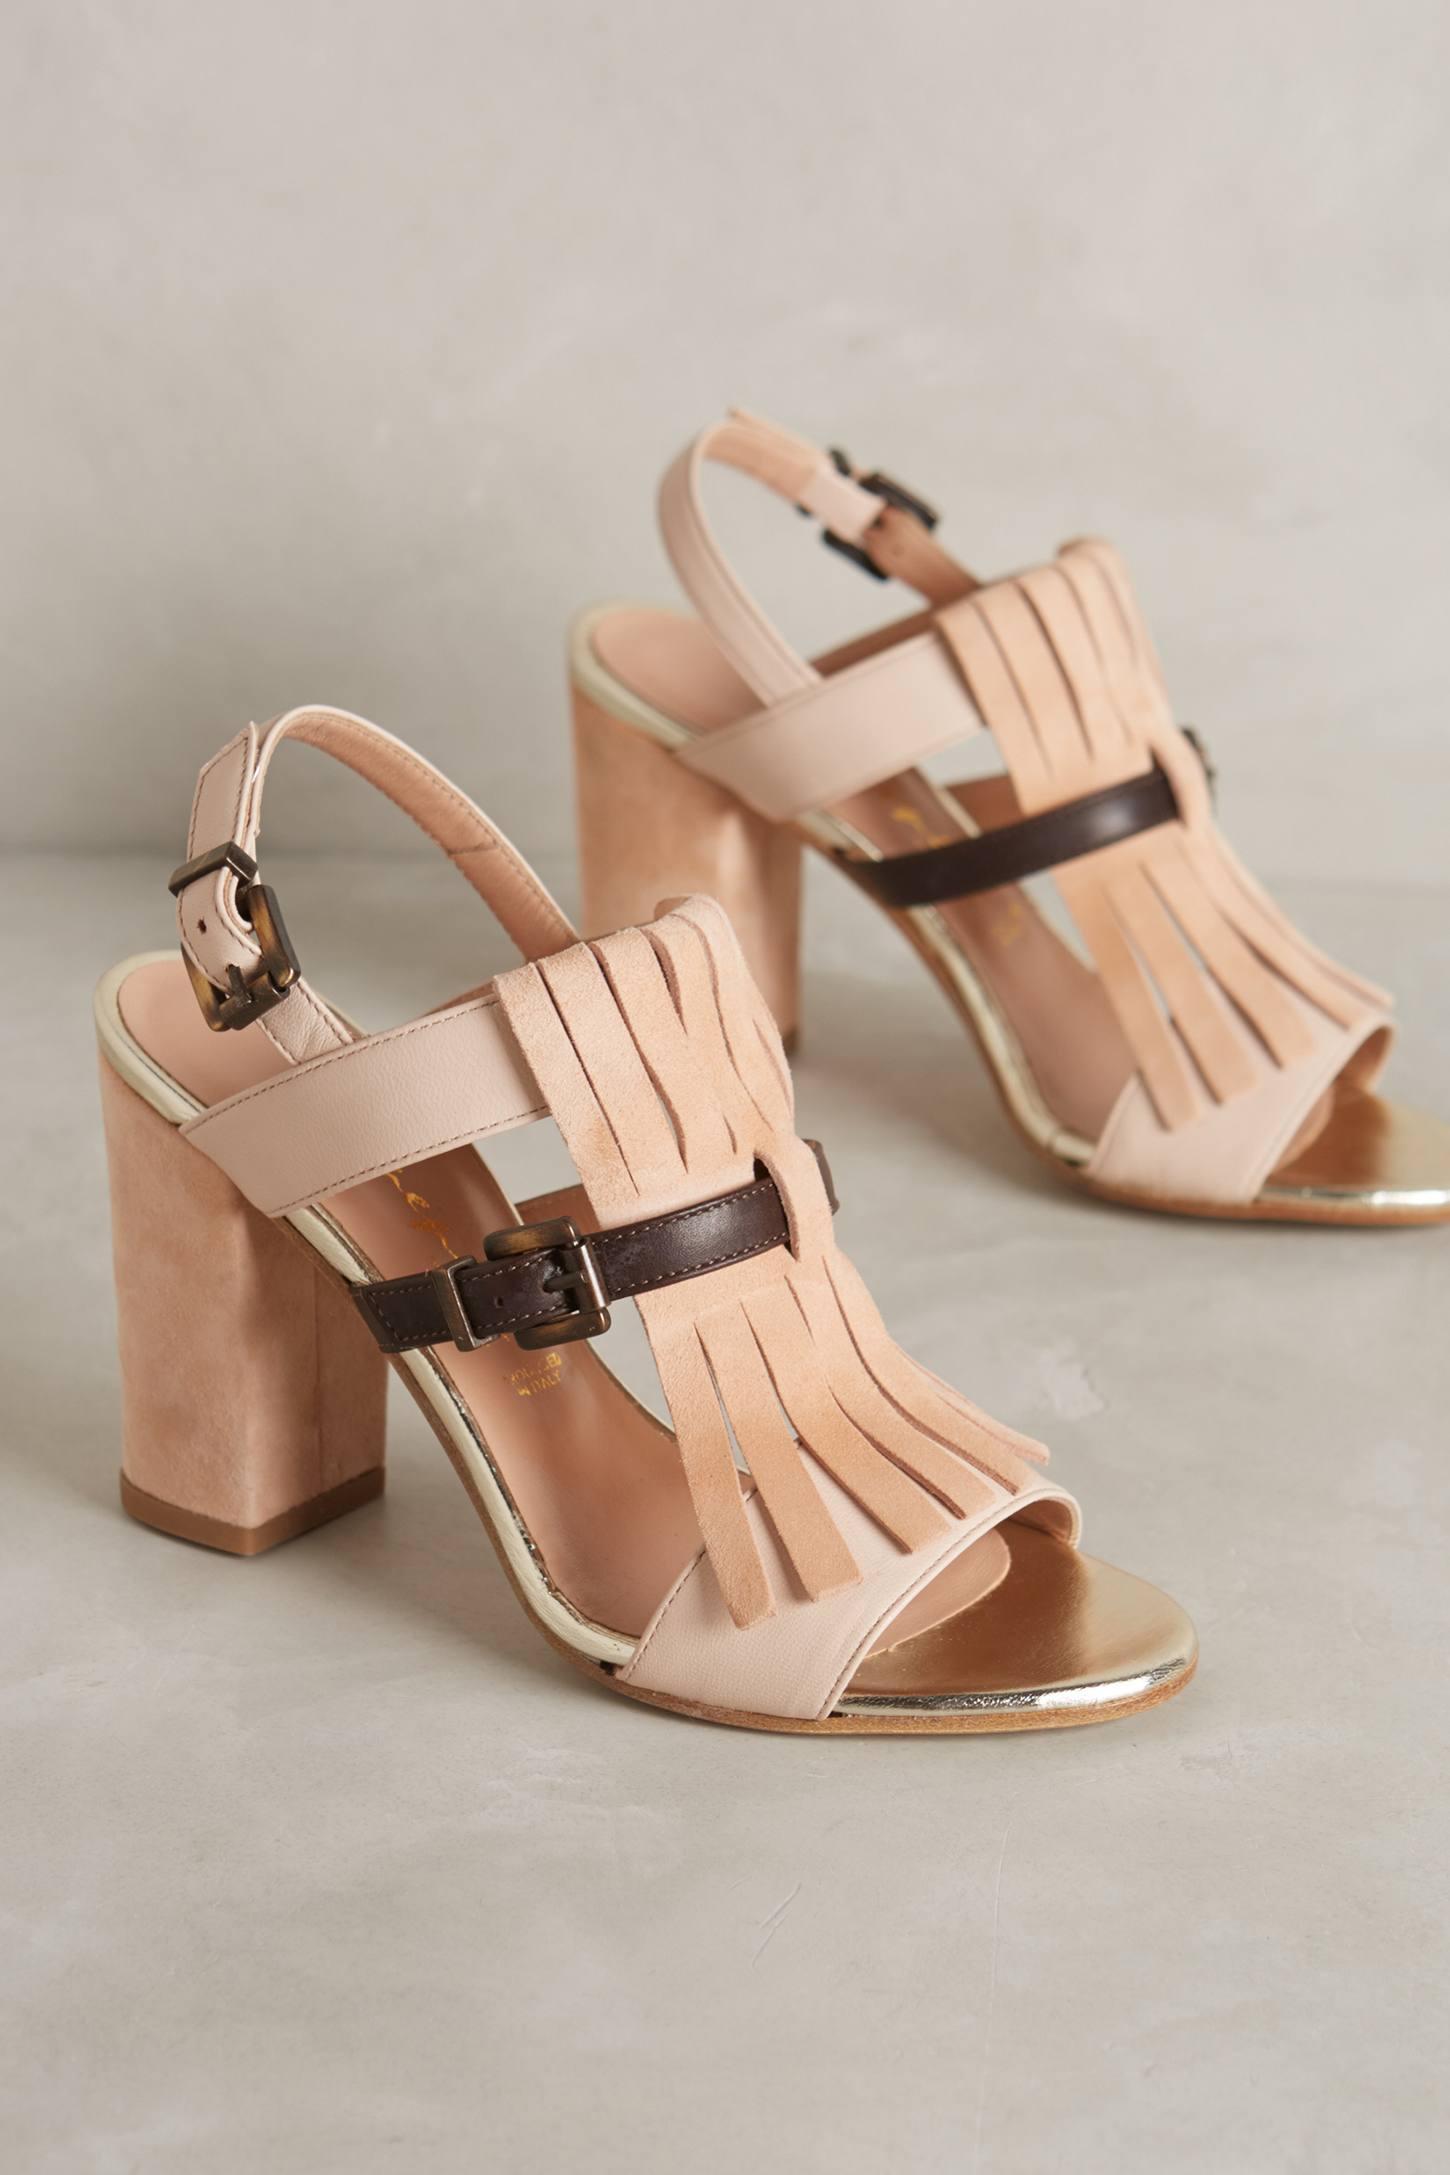 Shimmered Kiltie Heels